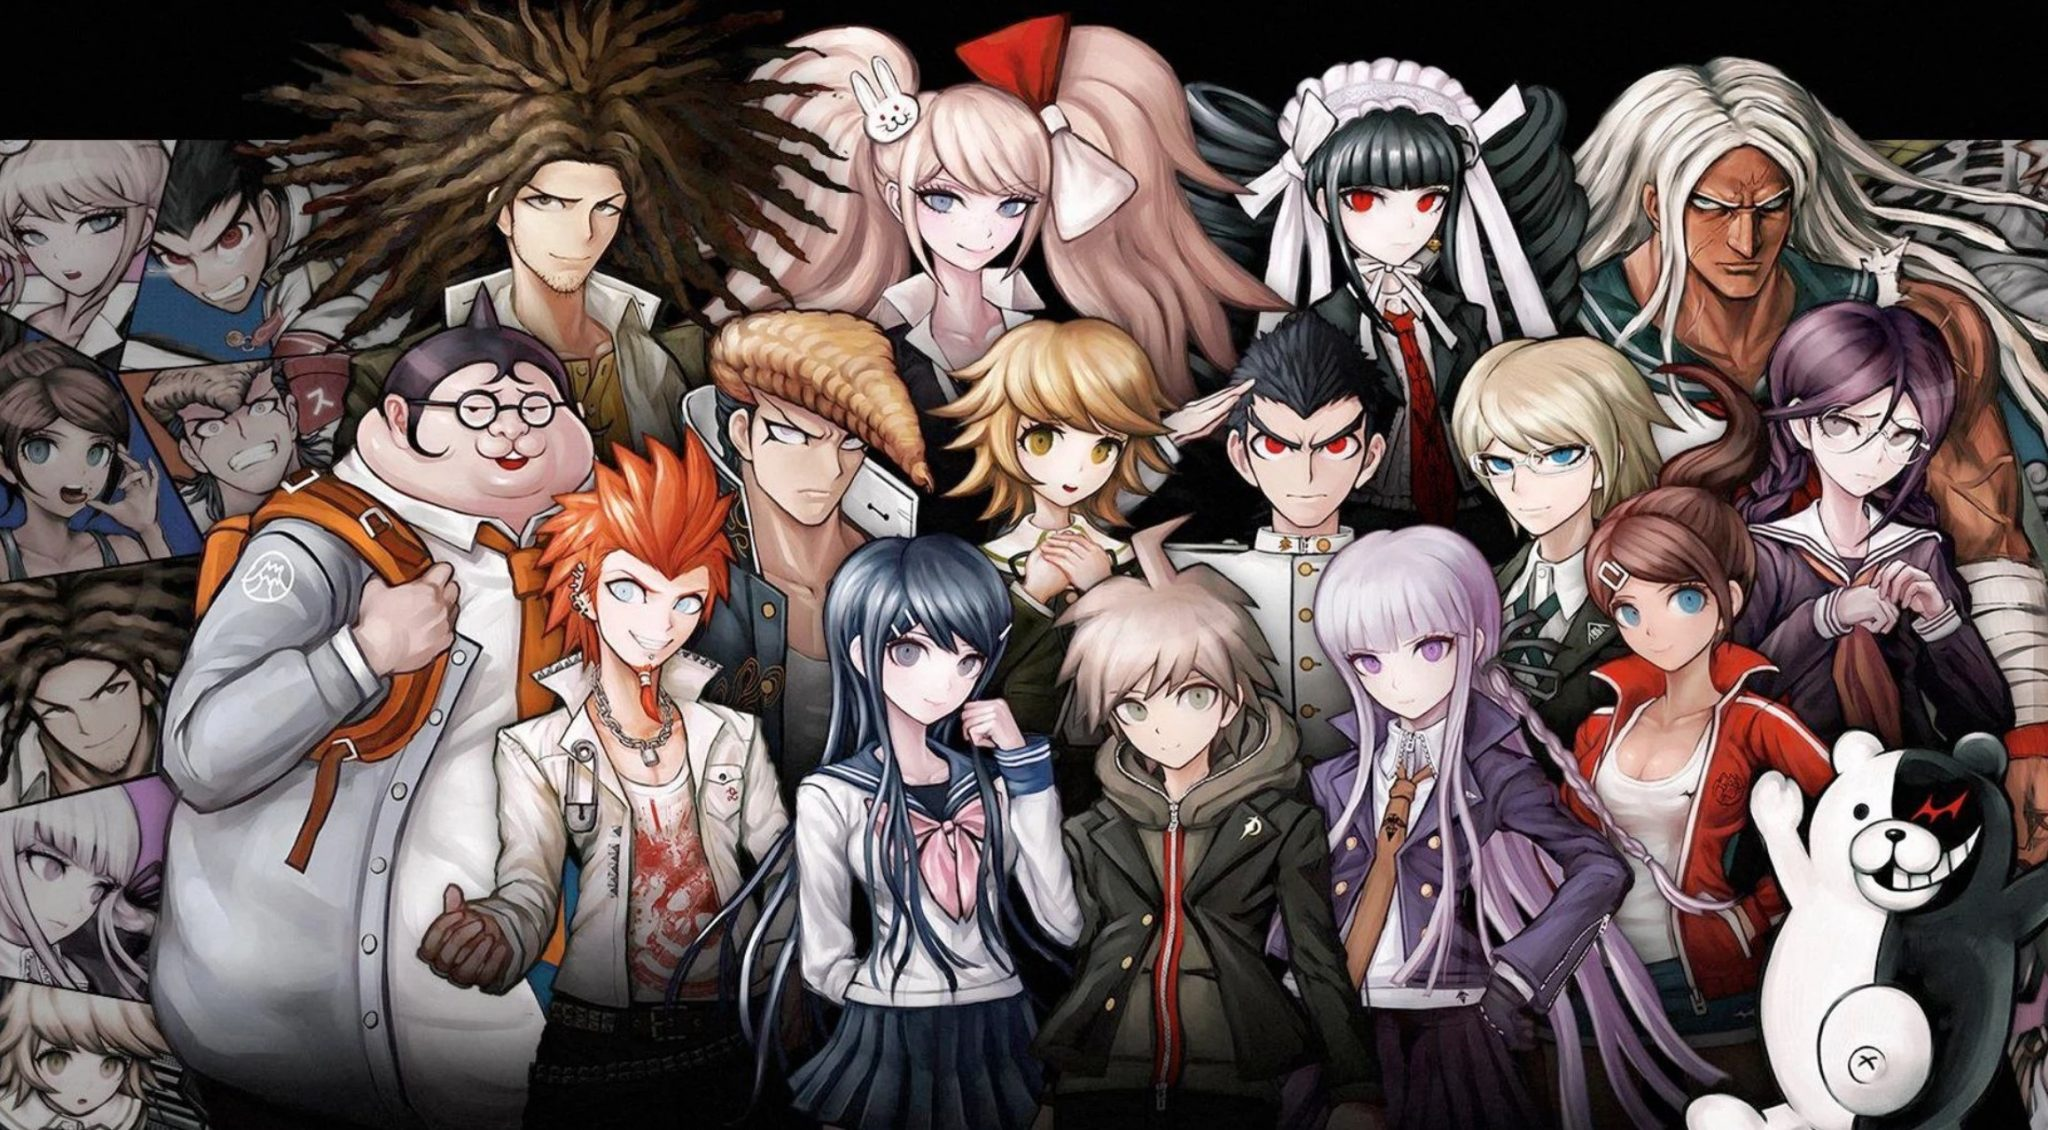 danganronpa anime key art